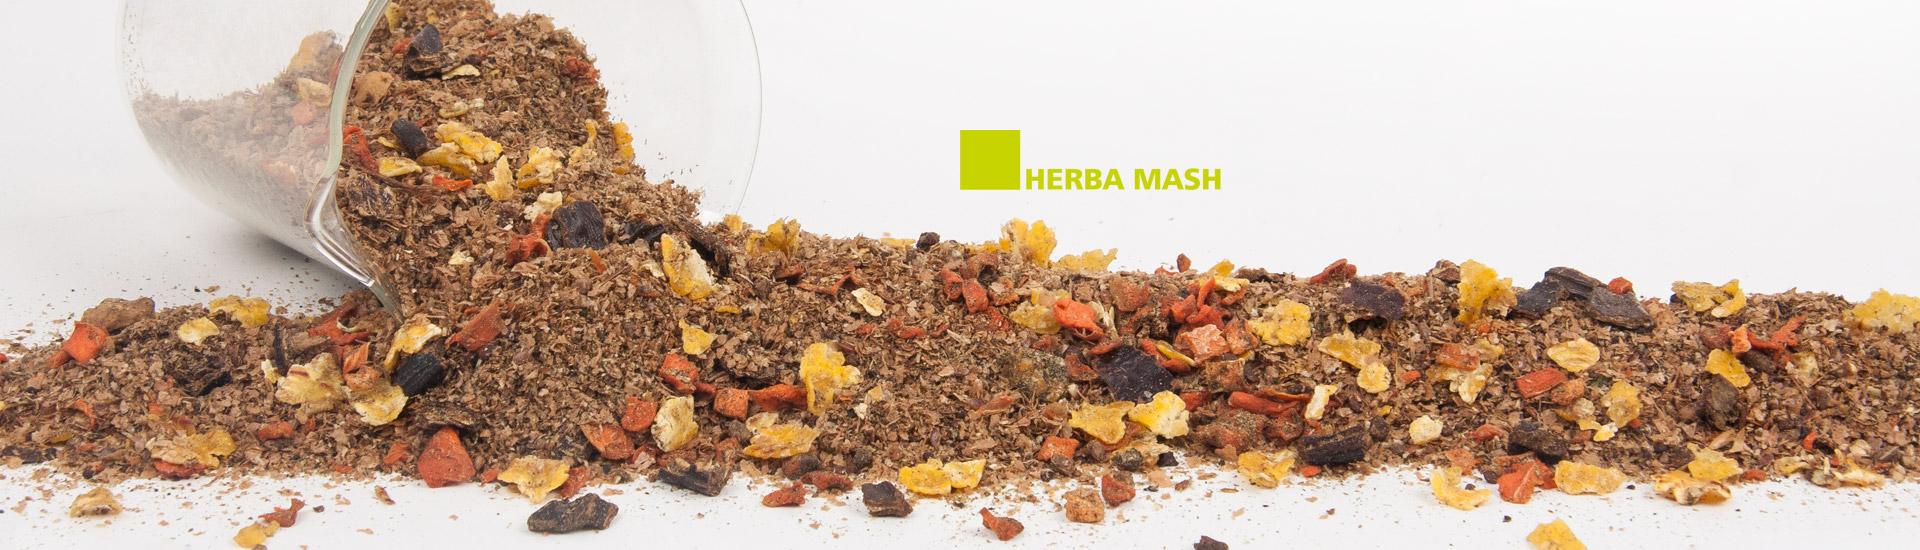 equinova - Herba Mash